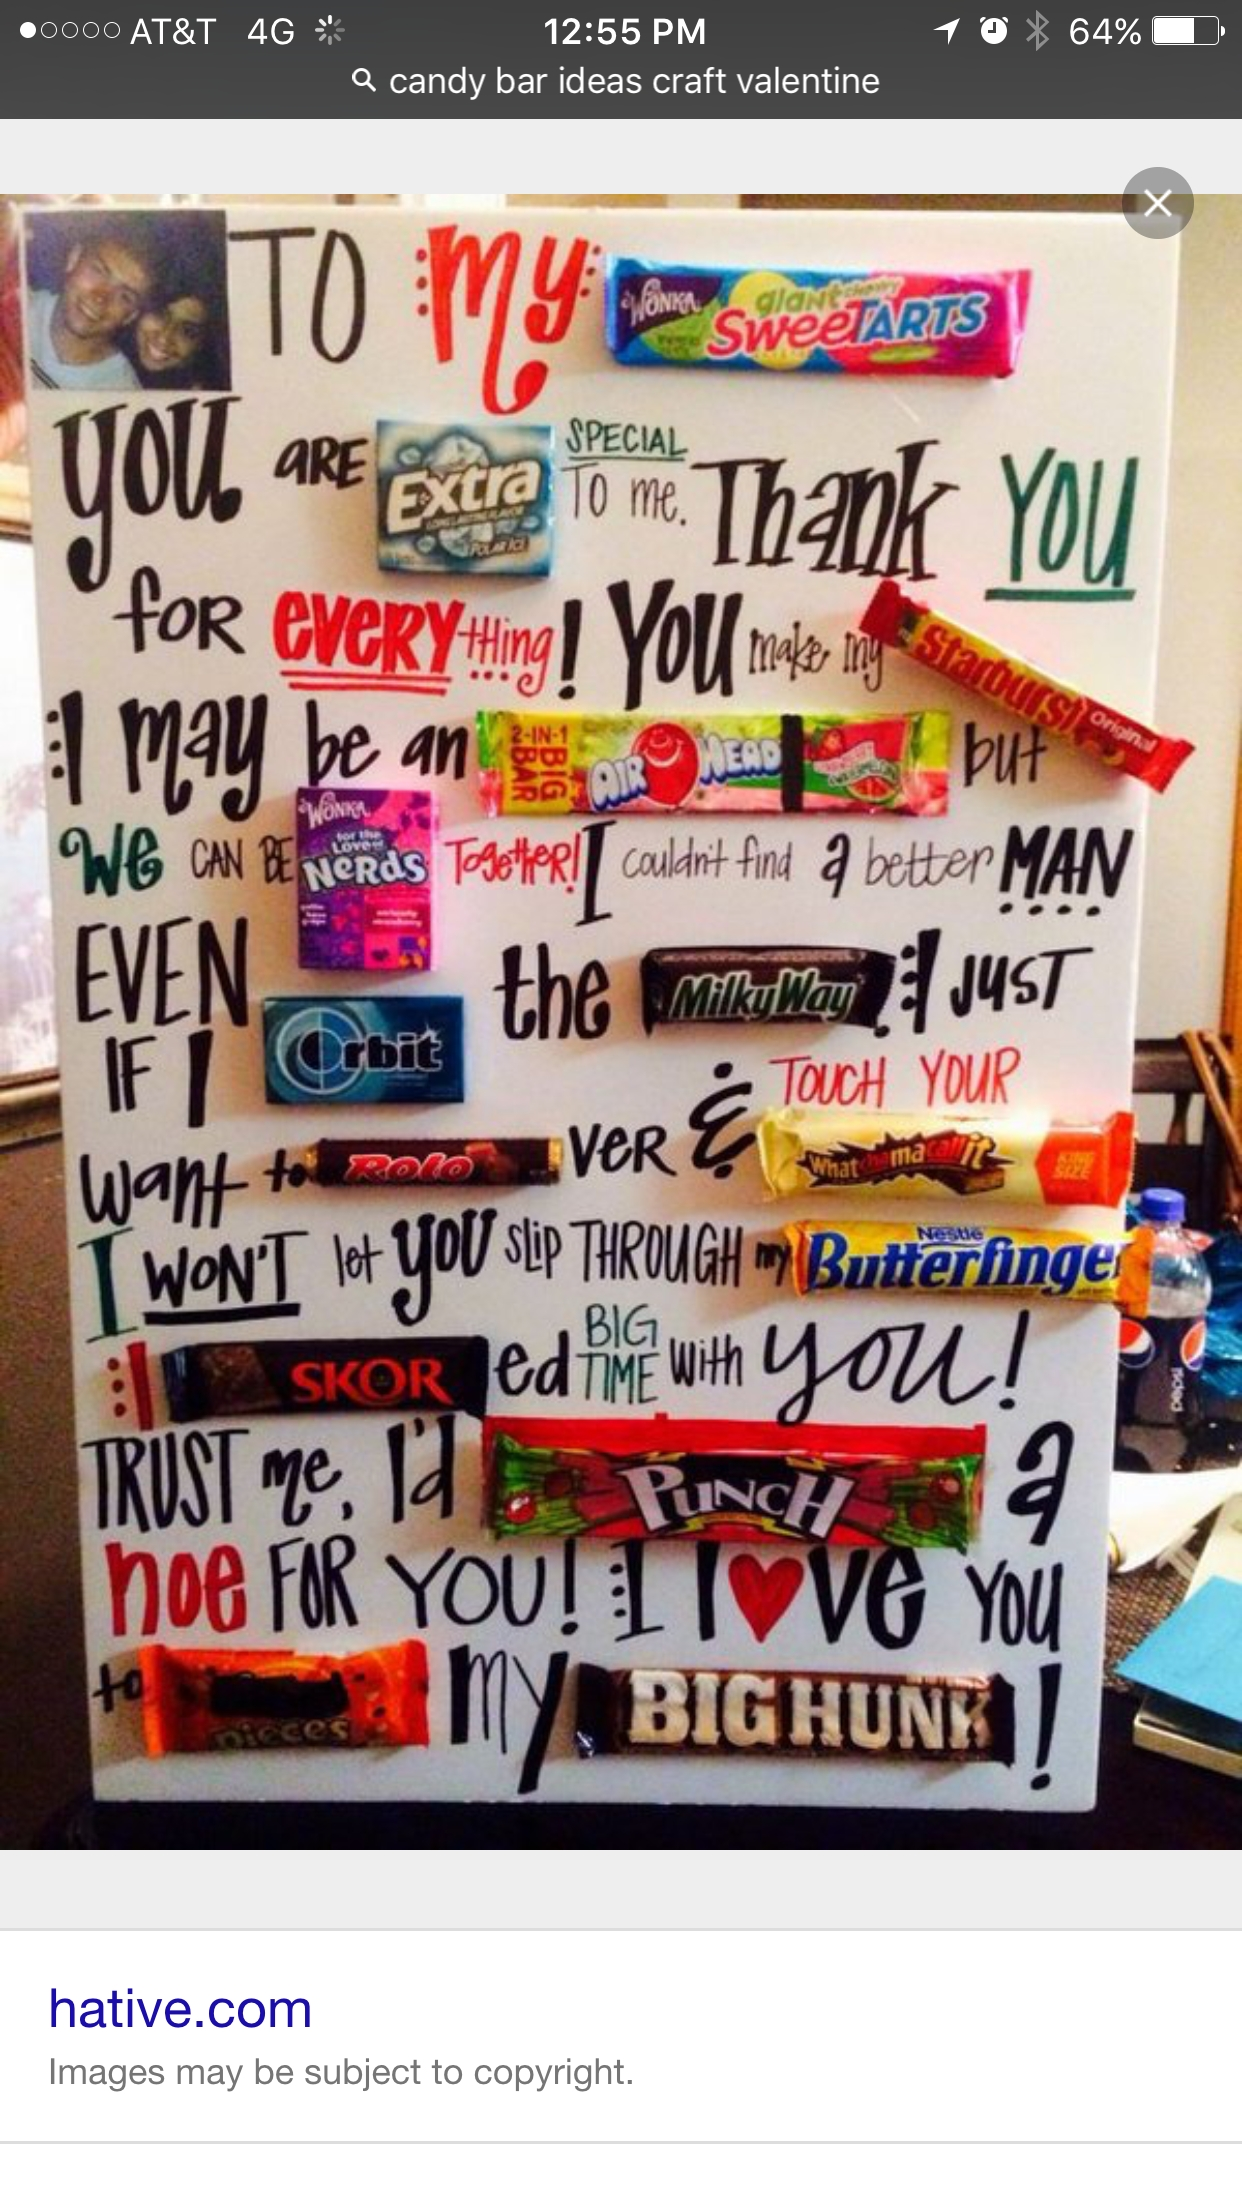 10 Unique Birthday Gift Ideas For Your Boyfriend Pinvpk Fun W Pauline Joseph On Valentine Preschool